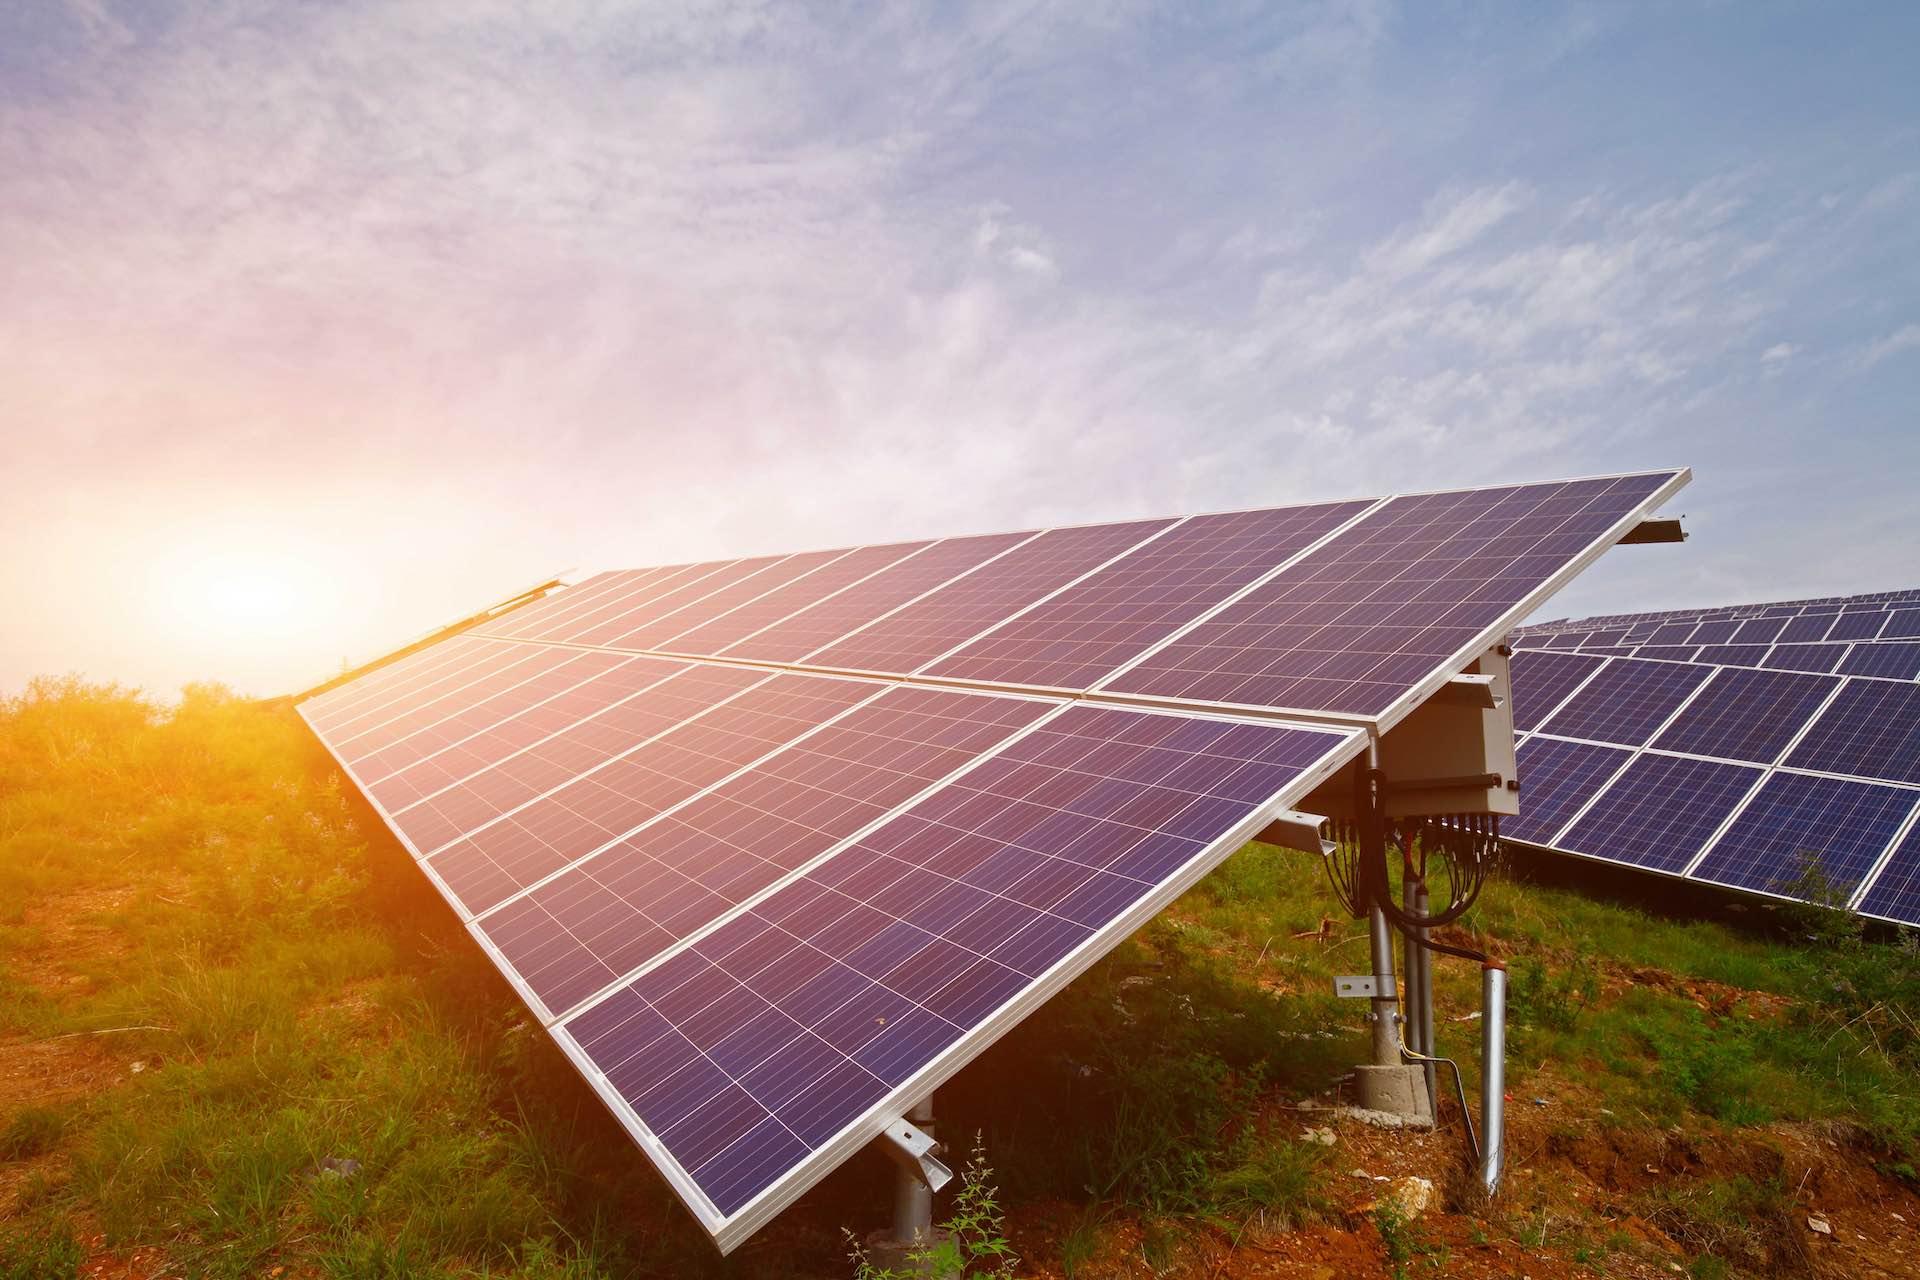 smeup soluzioni settore energia